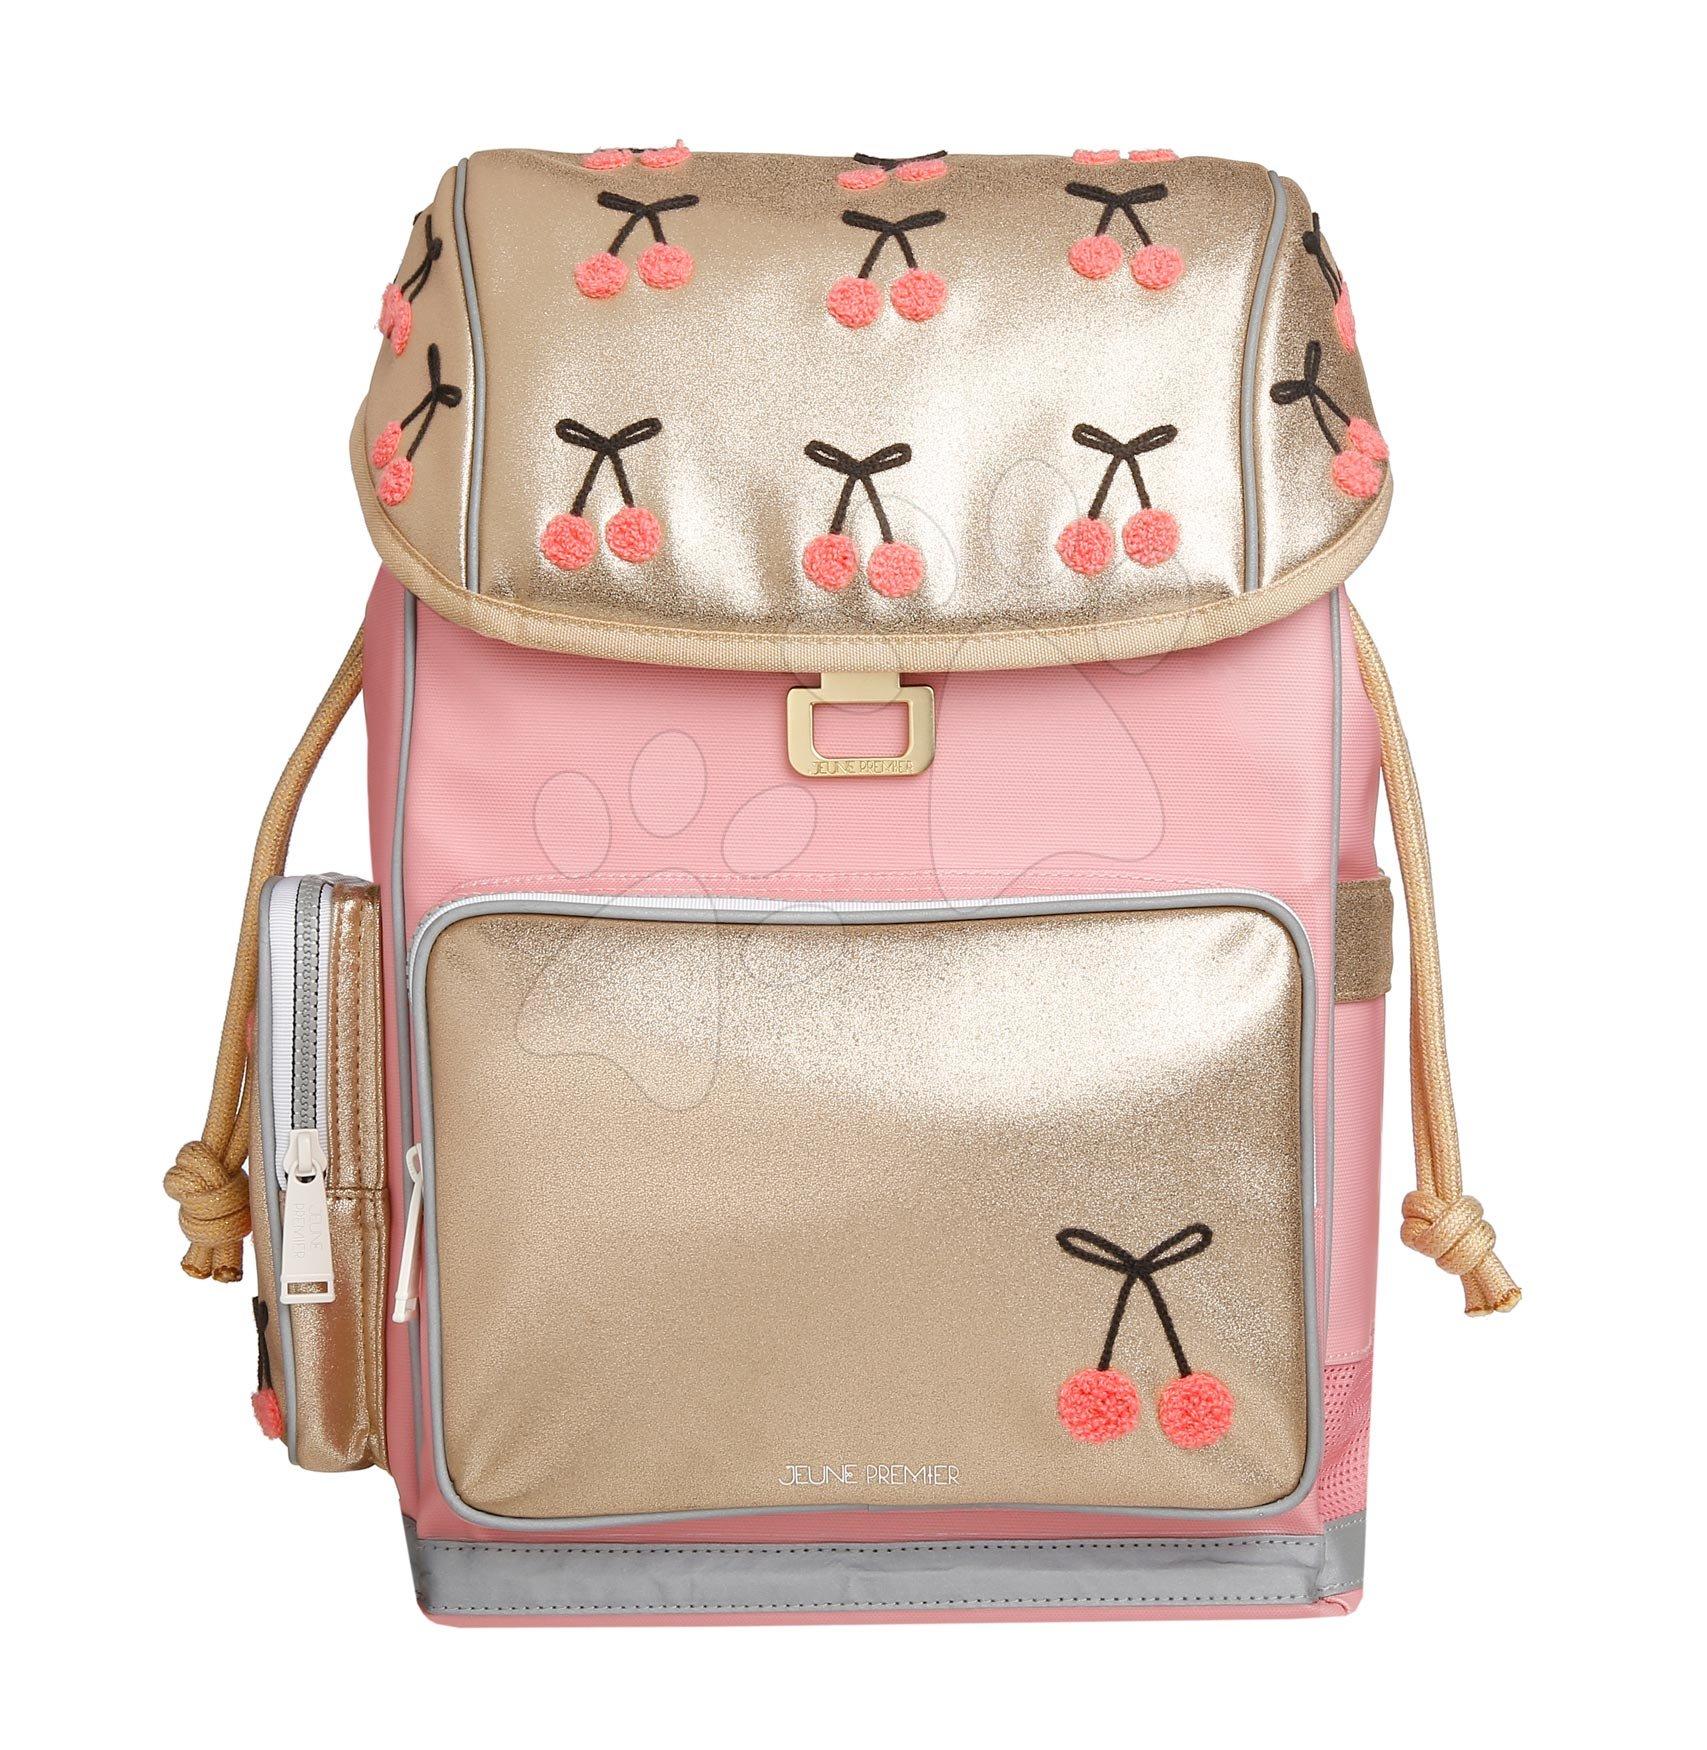 Školske torbe i ruksaci - Školski ruksak veliki Ergomaxx Cherry Pompon Jeune Premier ergonomski luksuzni dizajn 39*26 cm